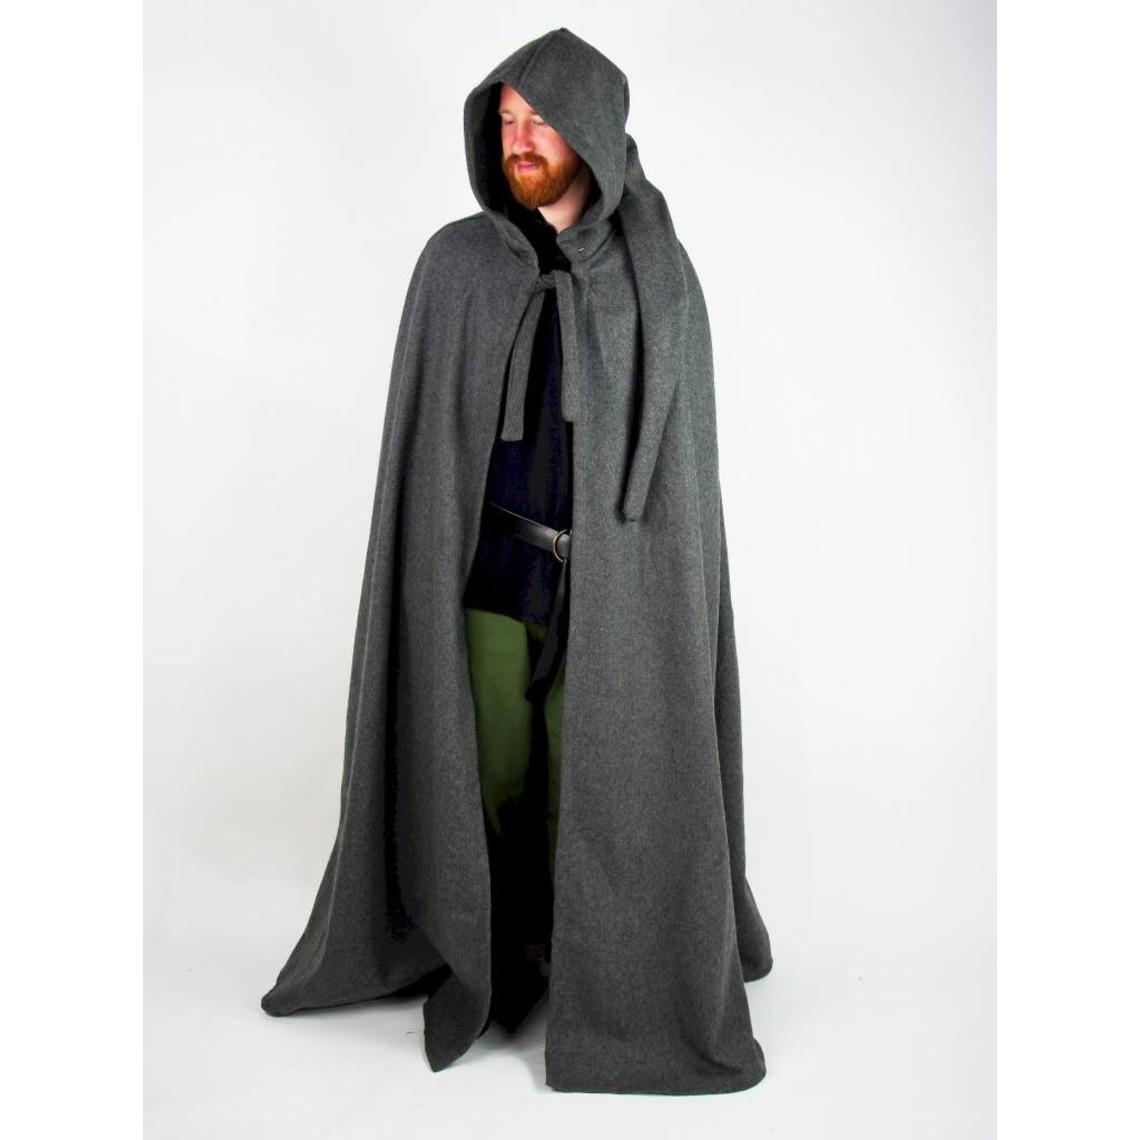 Leonardo Carbone Medieval cloak with hood, red